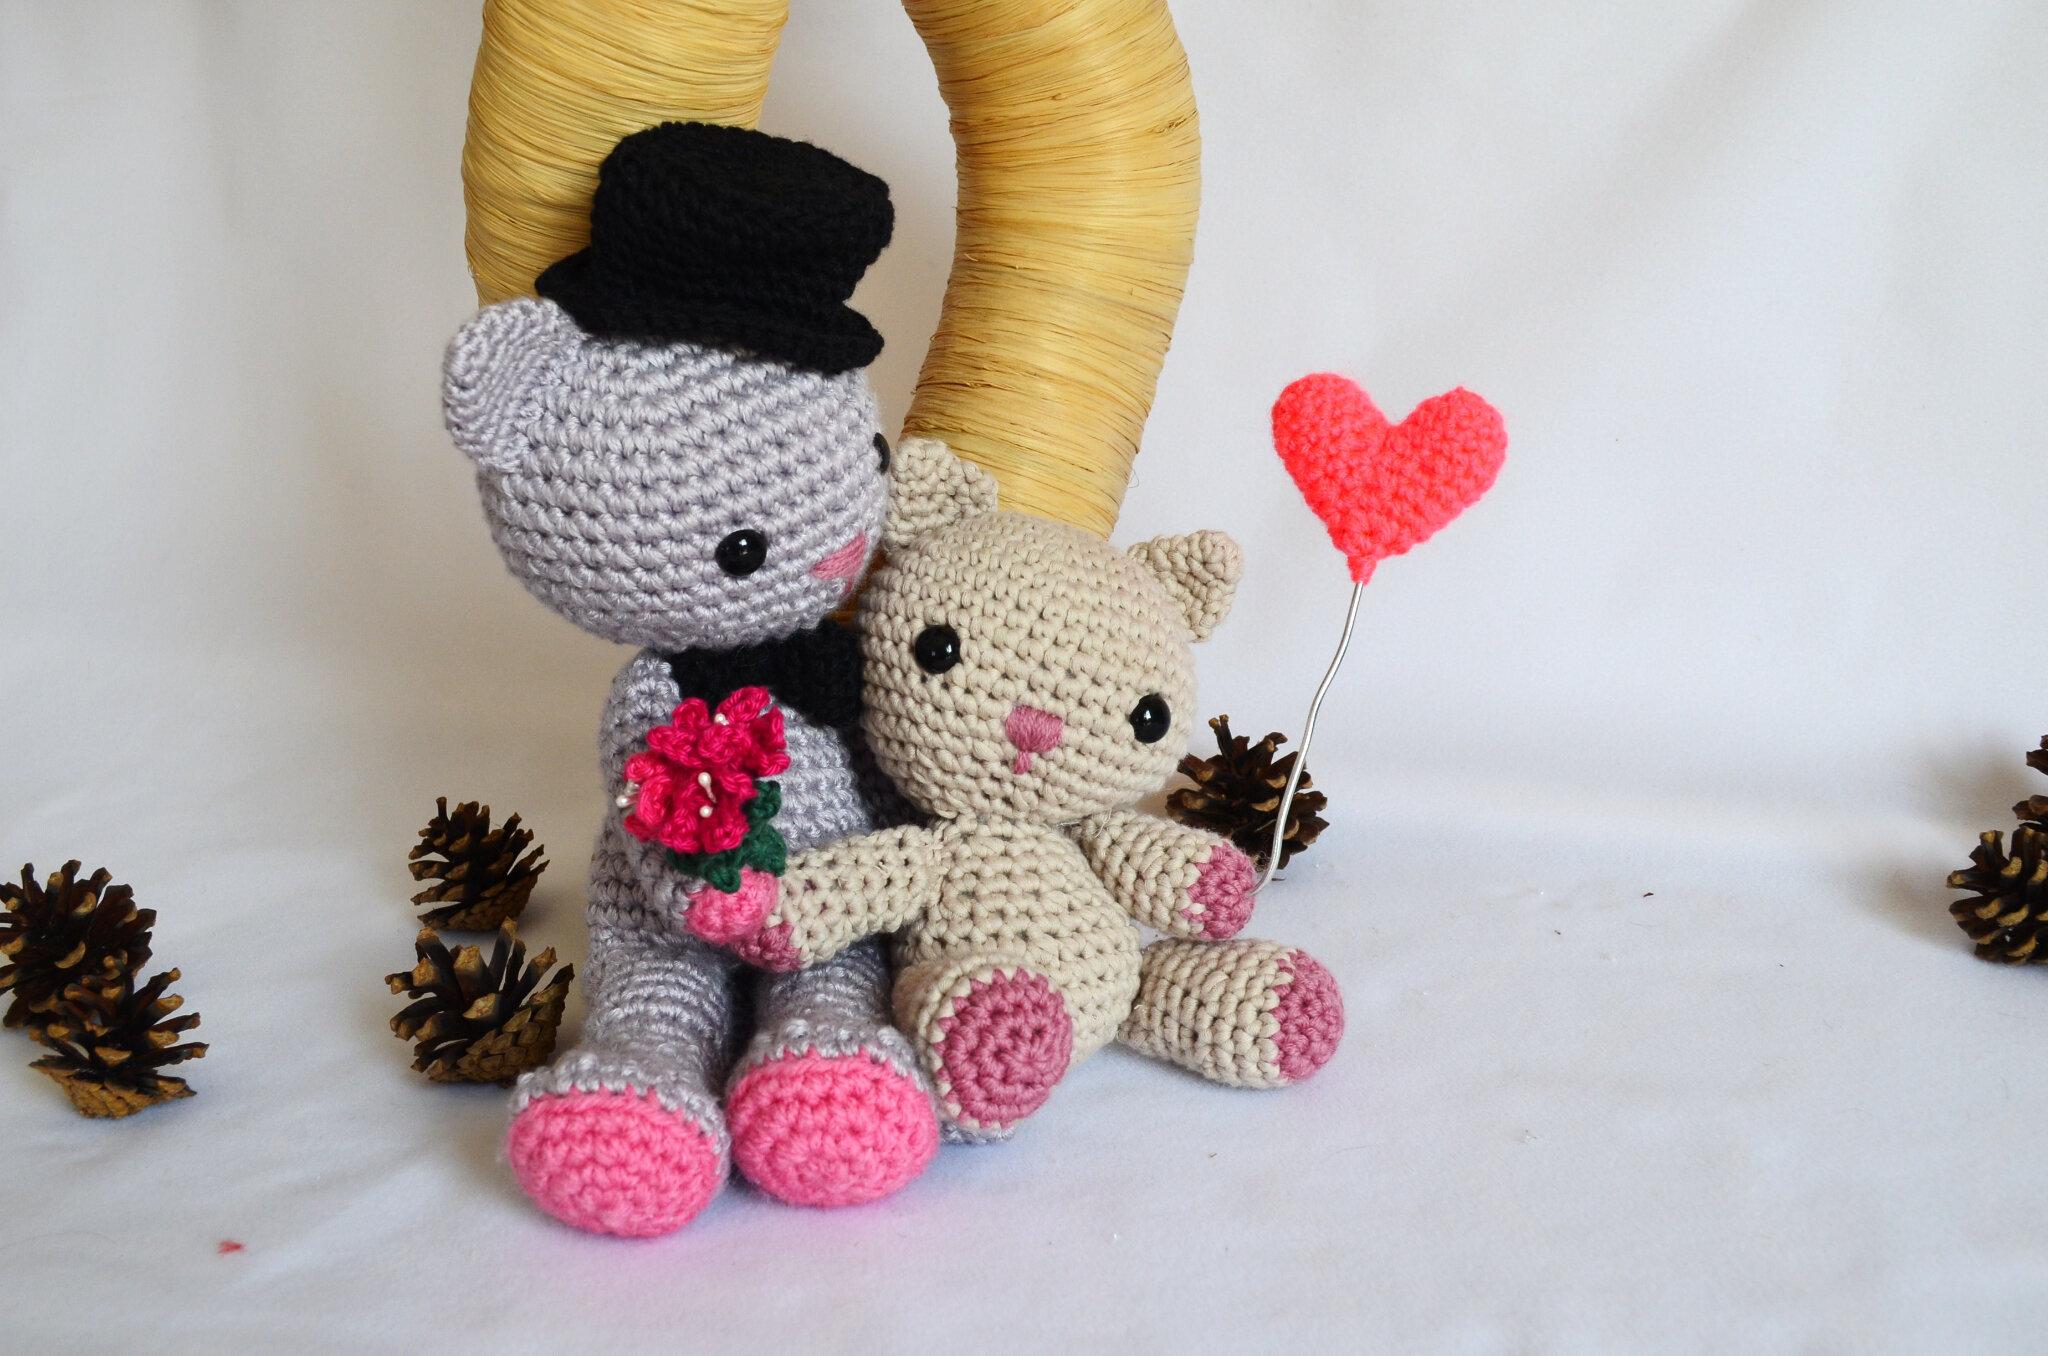 Amigurumi-chat-crochet-laine-animaux-la chouette bricole (10)